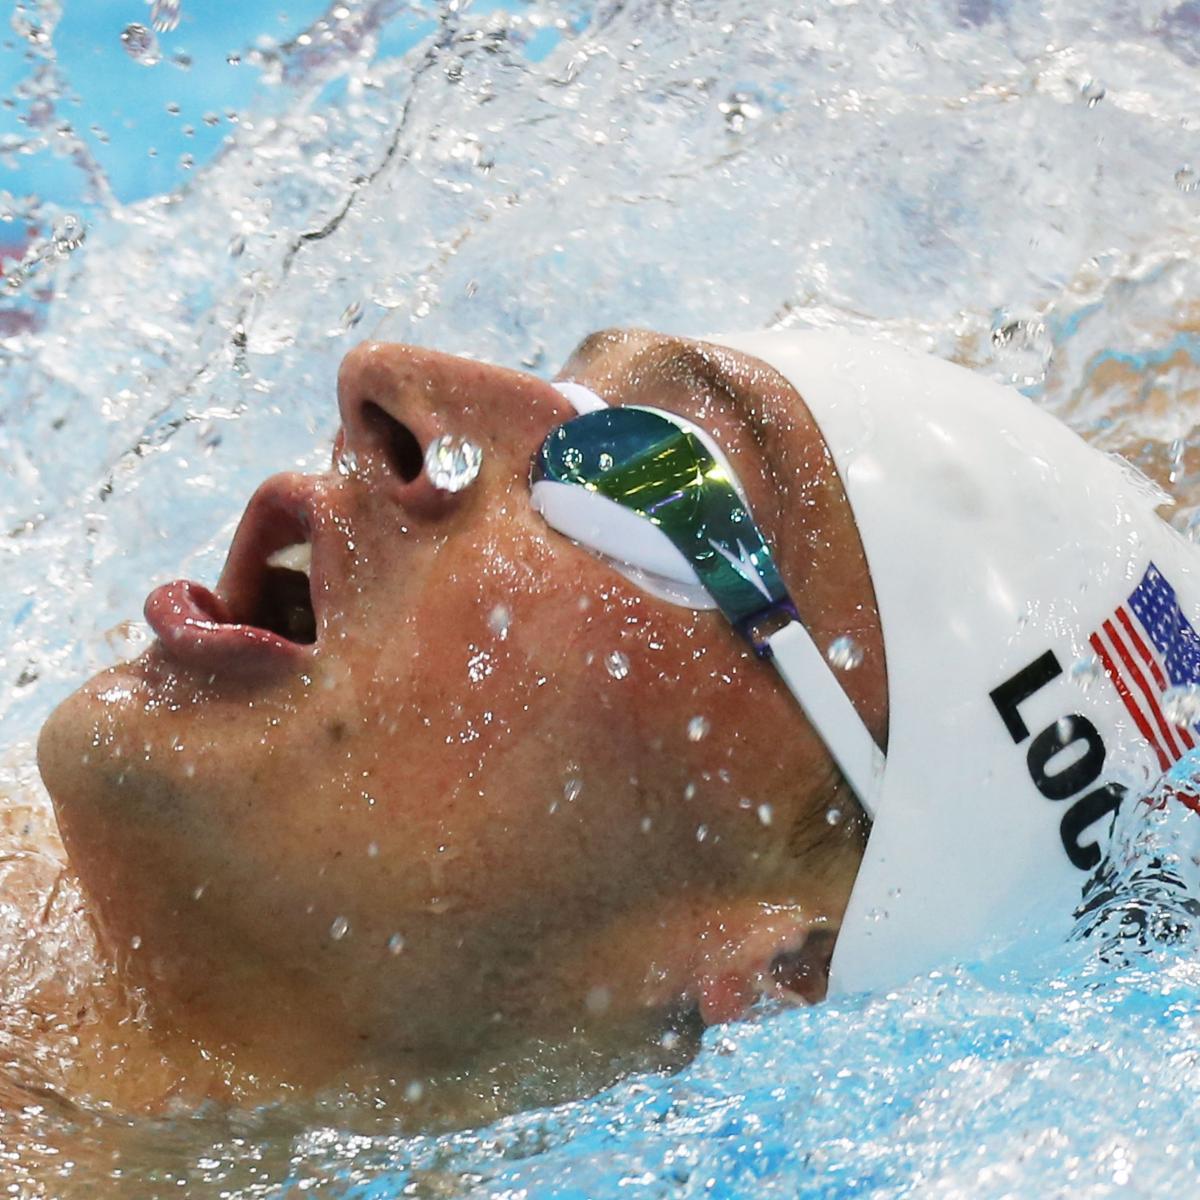 mens 200m backstr swimming - HD1200×1200